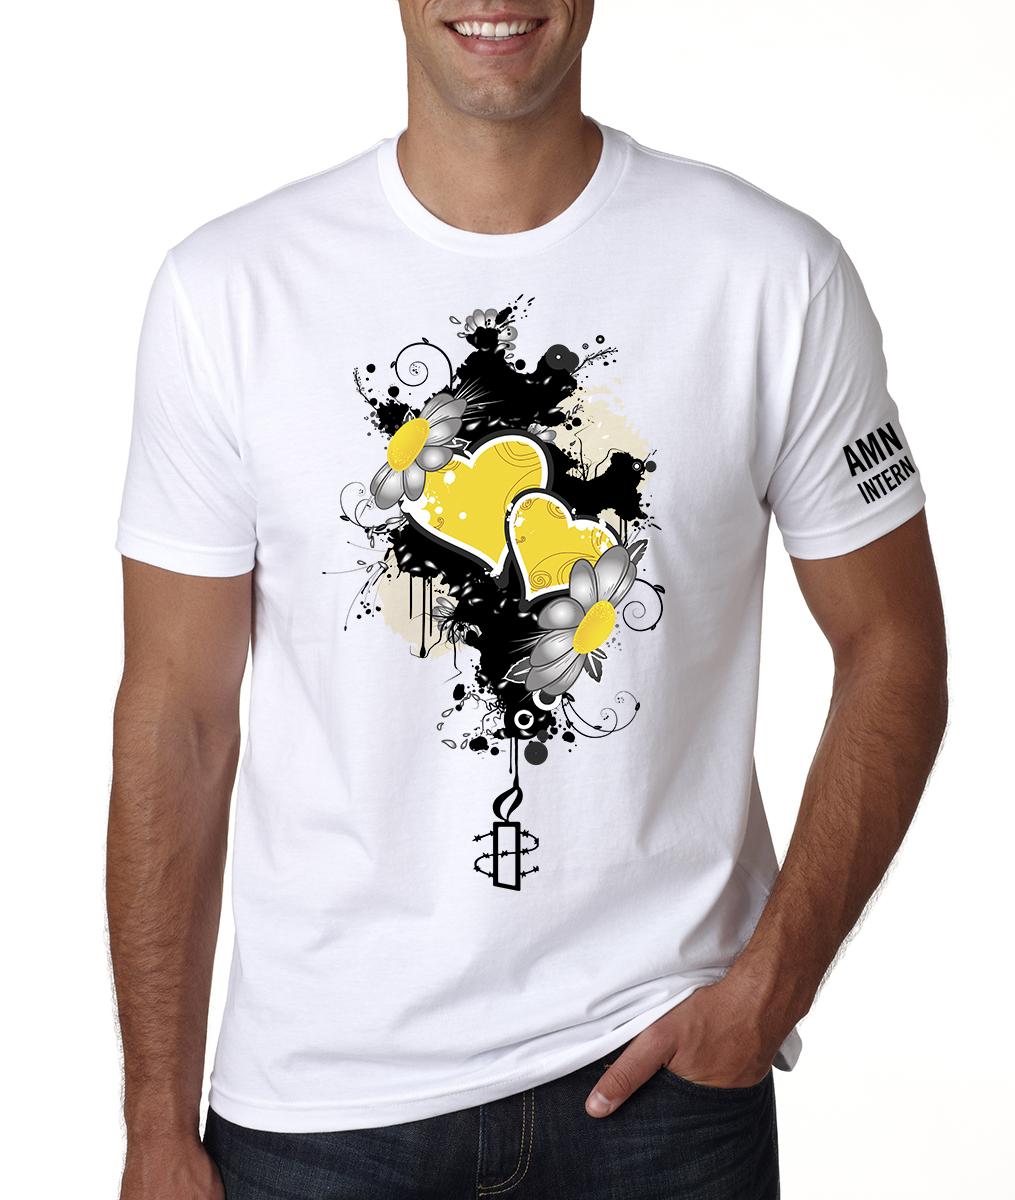 Shirt design australia - T Shirt Design By Futuredesigne For Amnesty International Australia T Shirt Design Competition